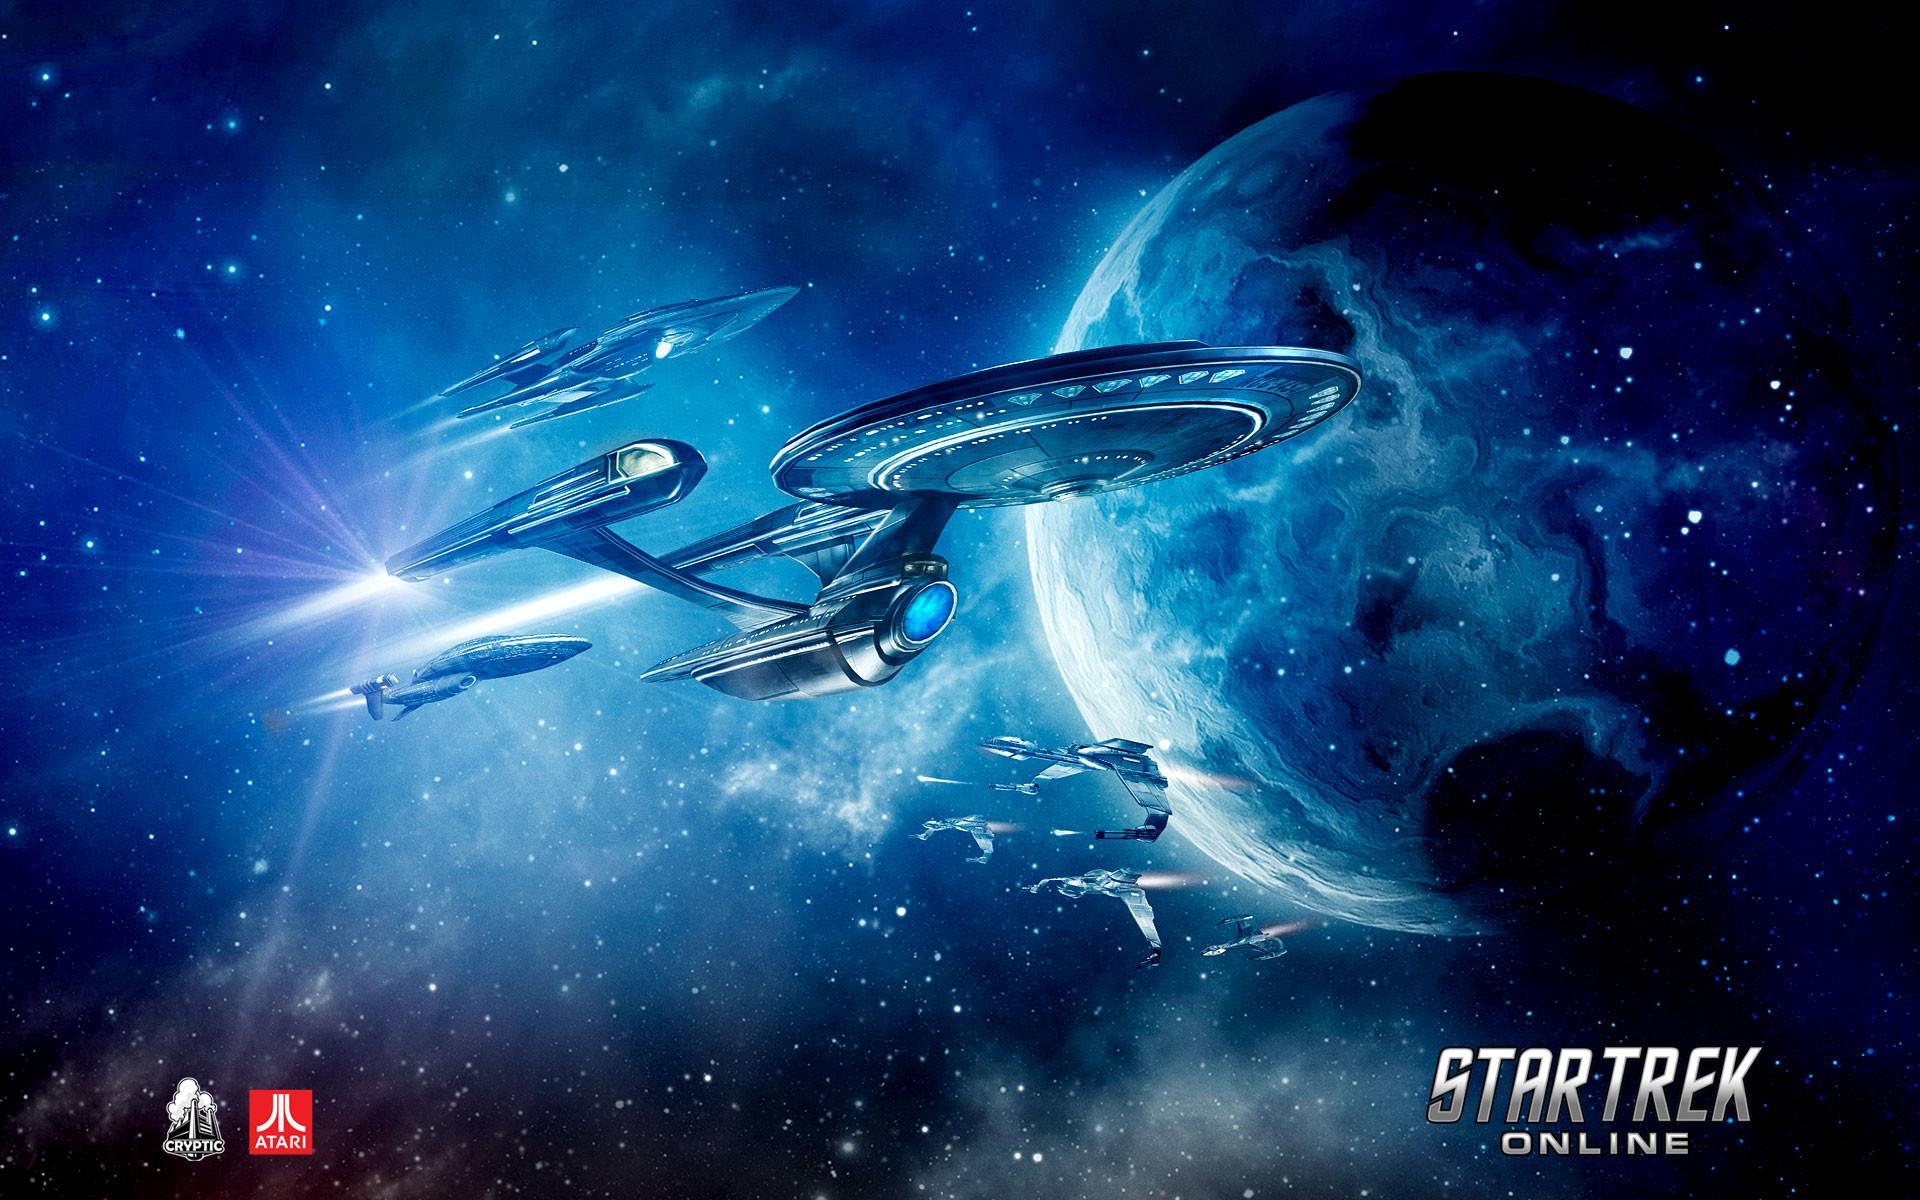 Fonds d'écran Star Trek PC et Tablettes (iPad, …